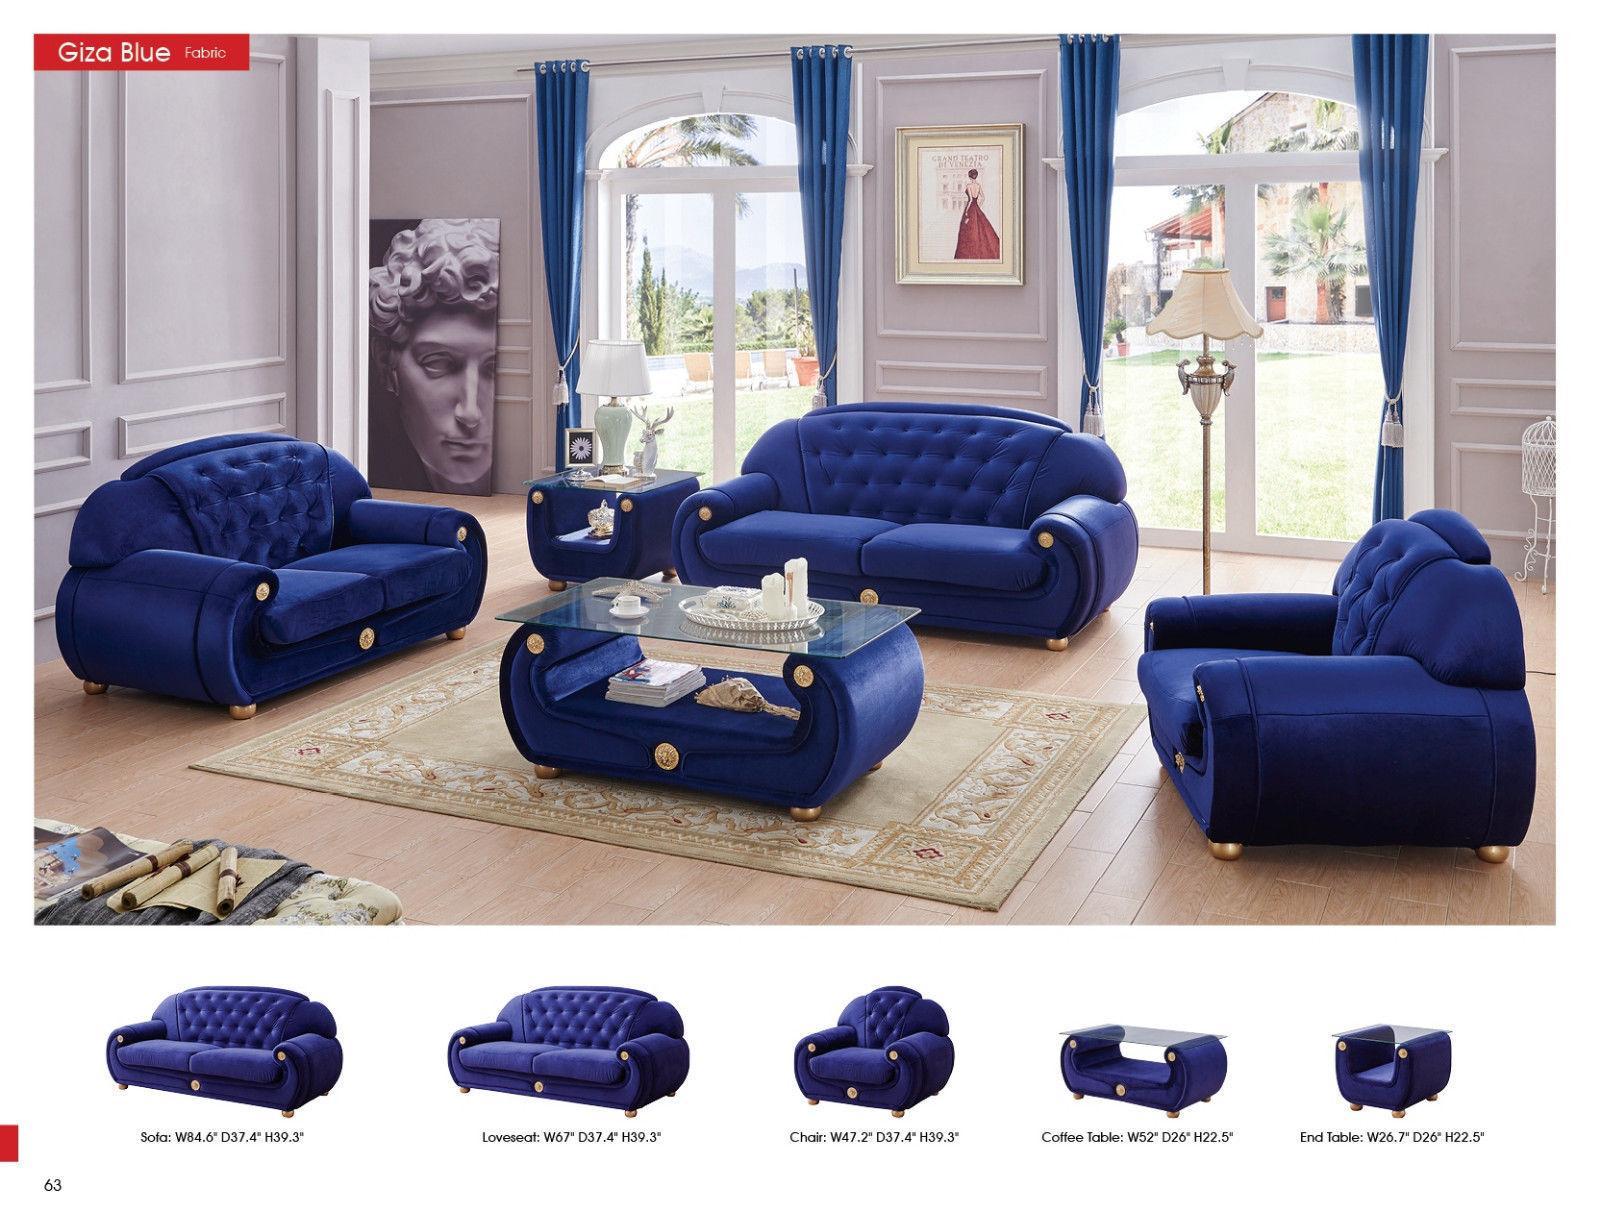 ESF Giza Microfiber Living Room Sofa Set 3pc. Dark Blue Chic Contemporary Style